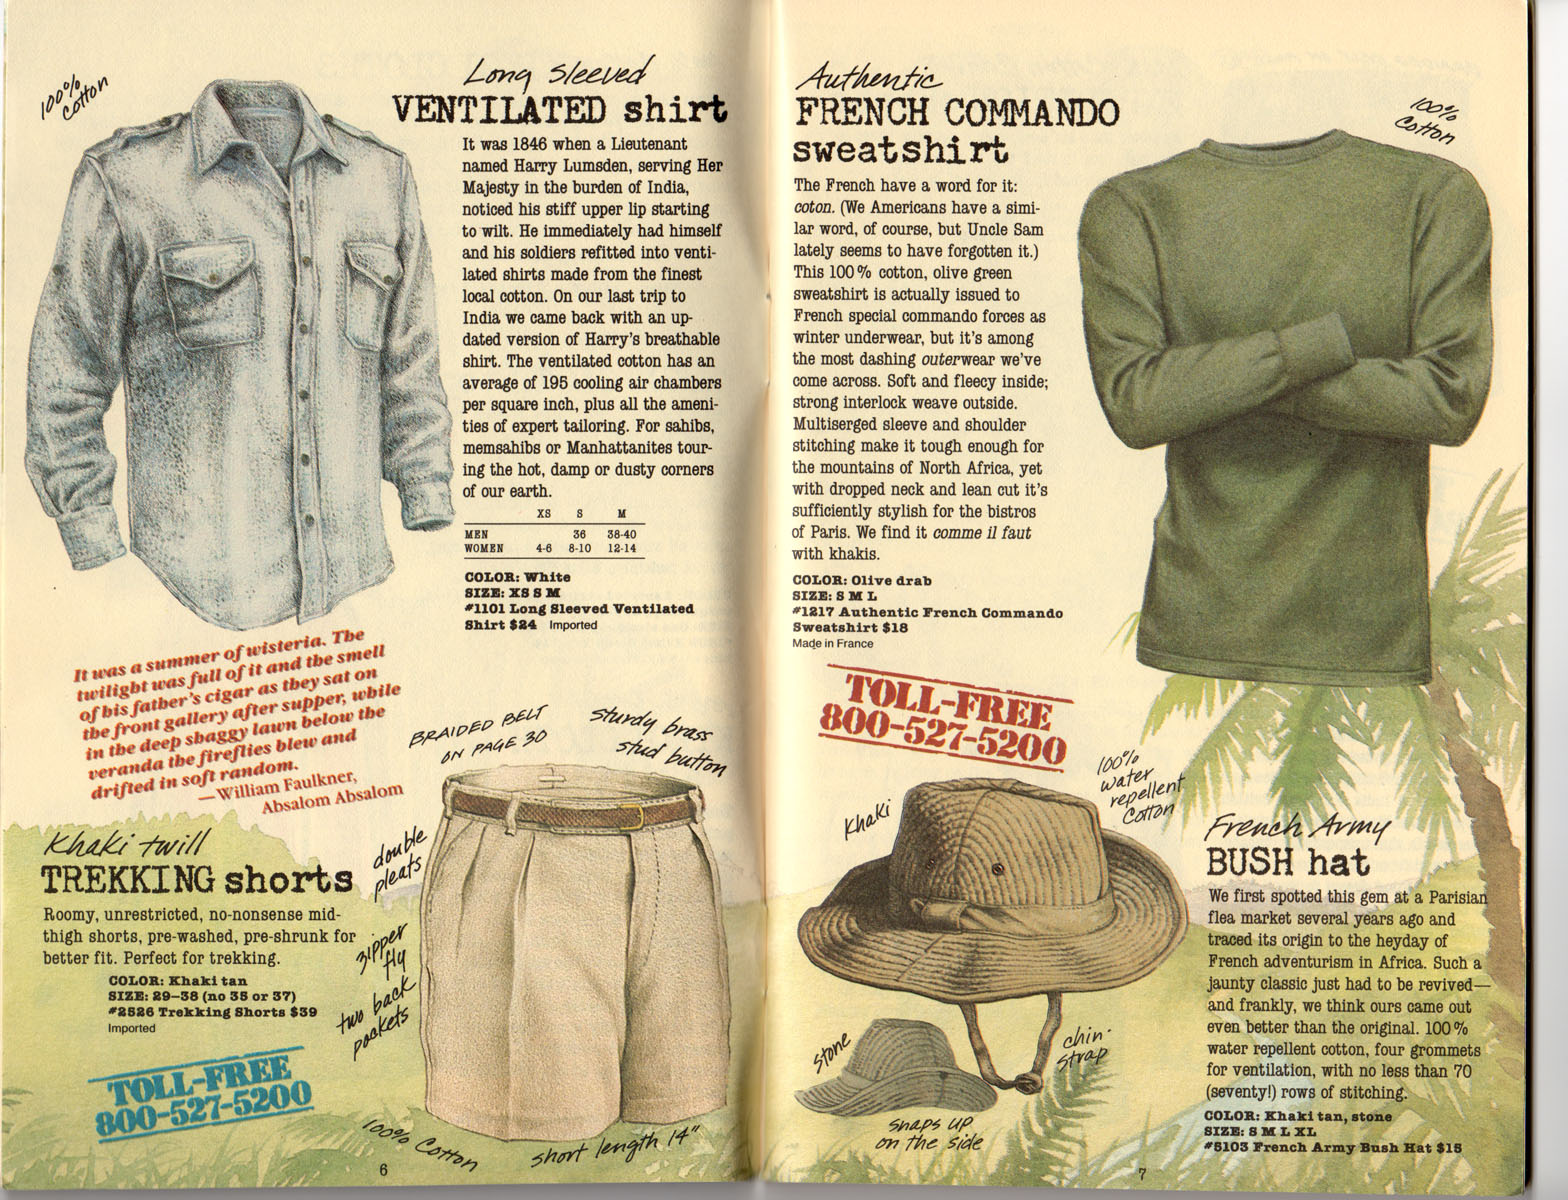 Banana Republic Summer 1985 Update #24 Ventilated Shirt, Trekking Shorts, French Commando Sweatshirt, French Army Bush Hat